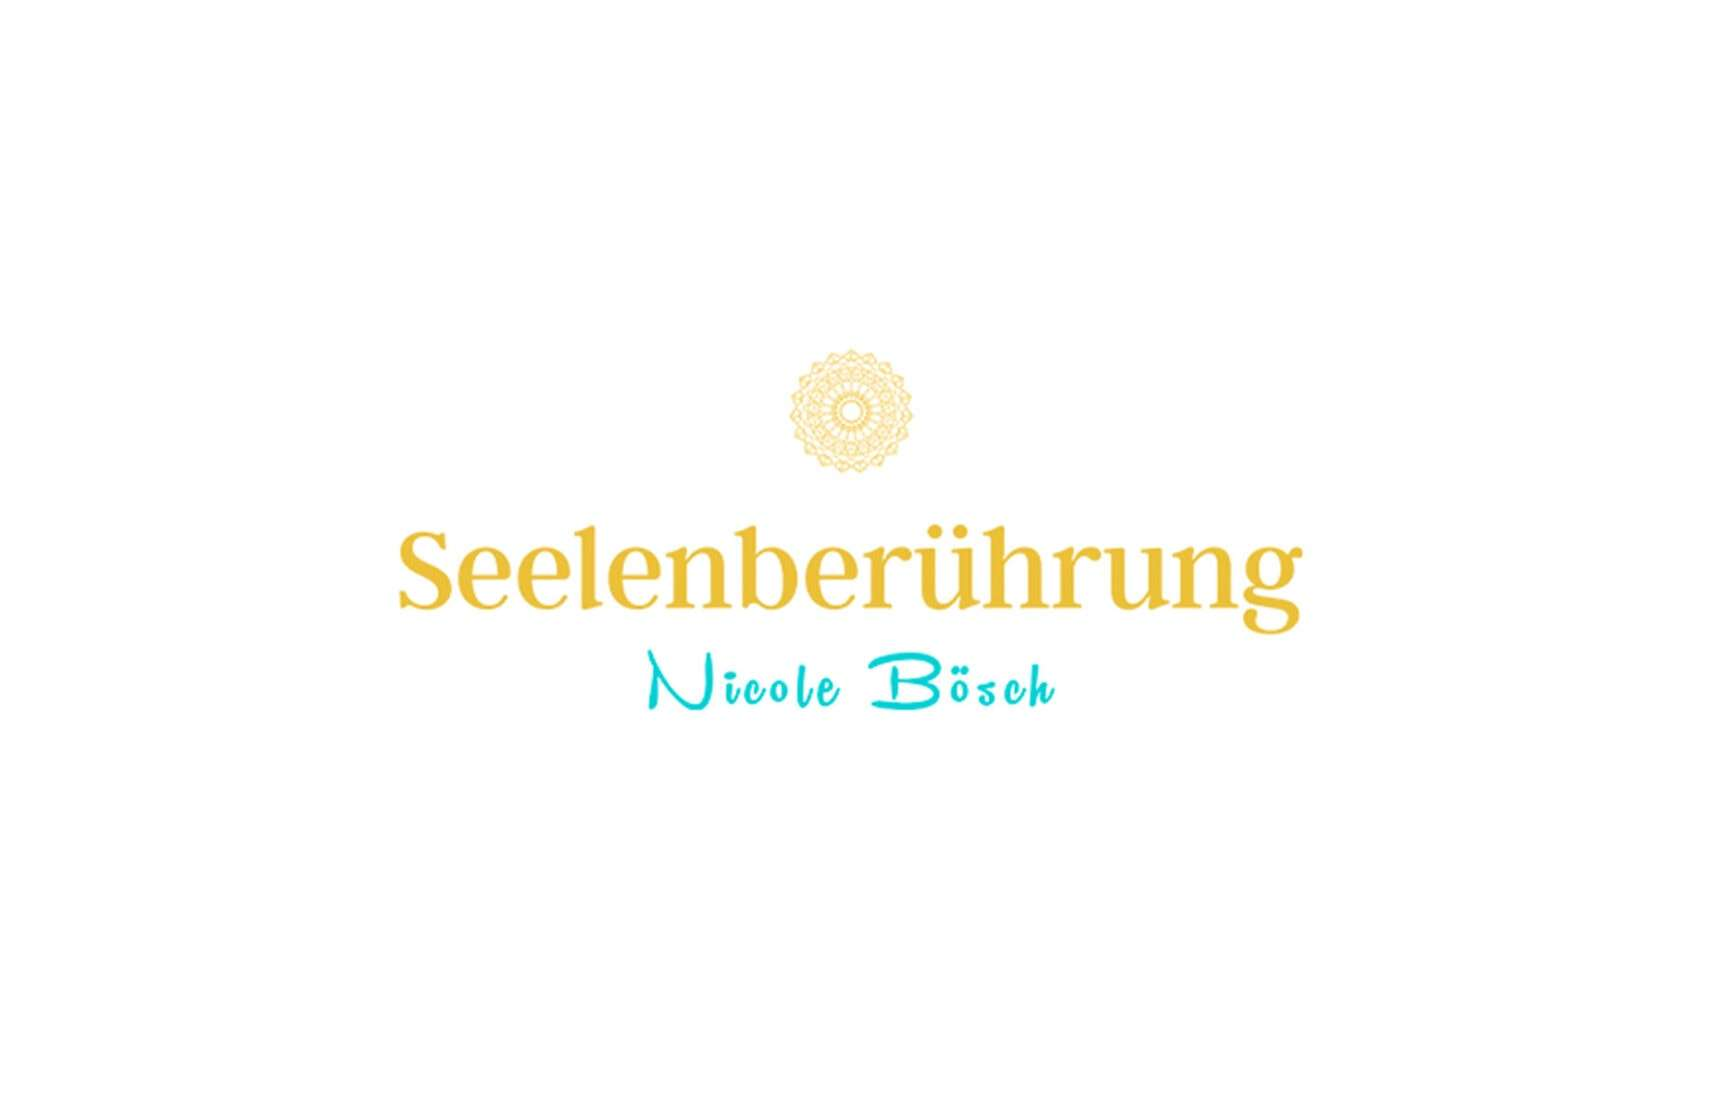 website-neu-dezent-schoen-gestaltet-michaelwalch-vorarlberg-seelen-beruehrung